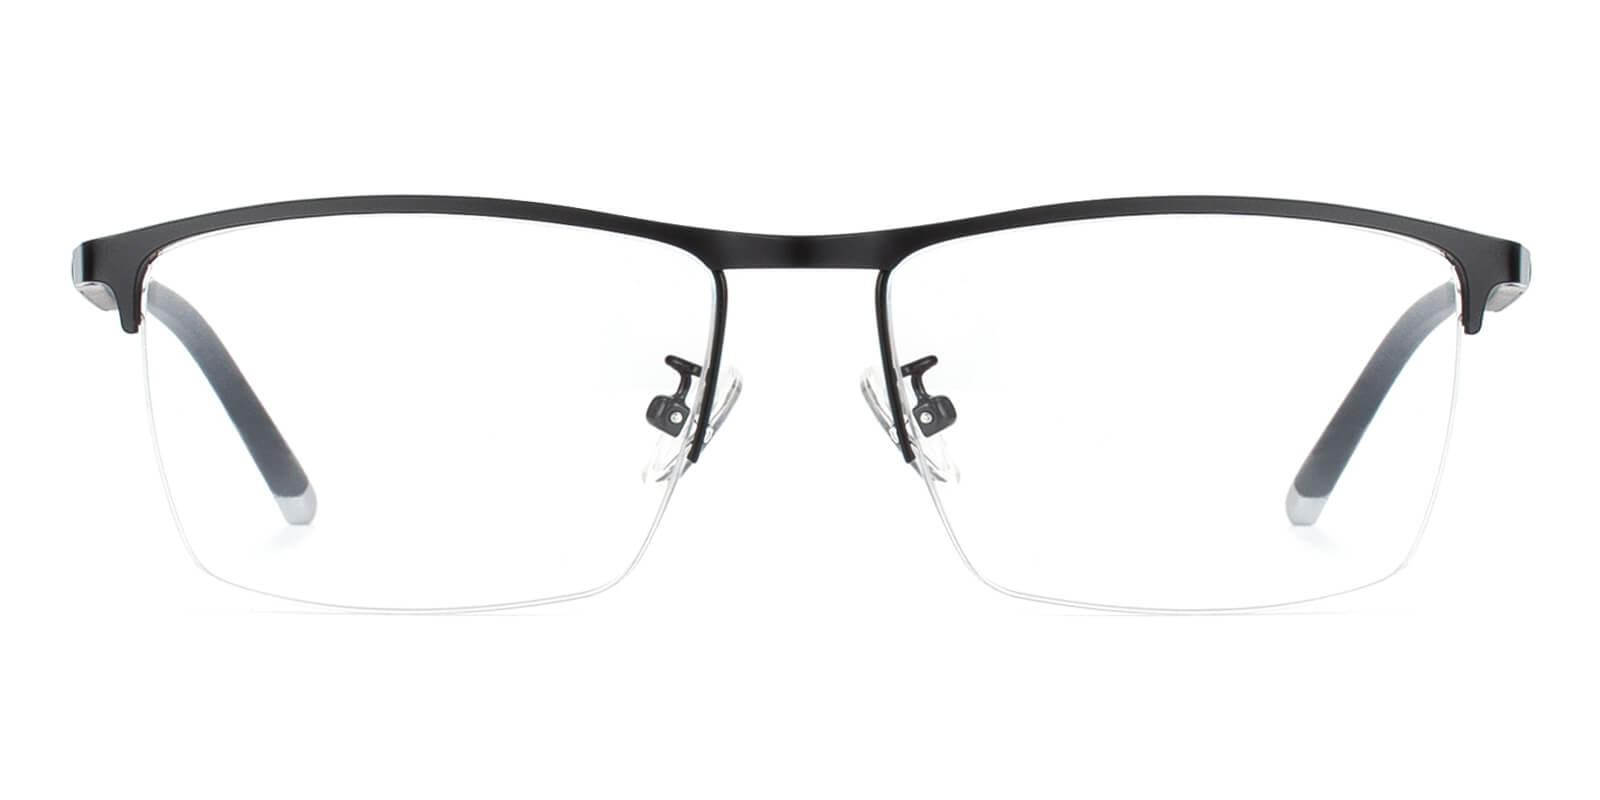 Simon-Black-Rectangle-Metal-Eyeglasses-additional2